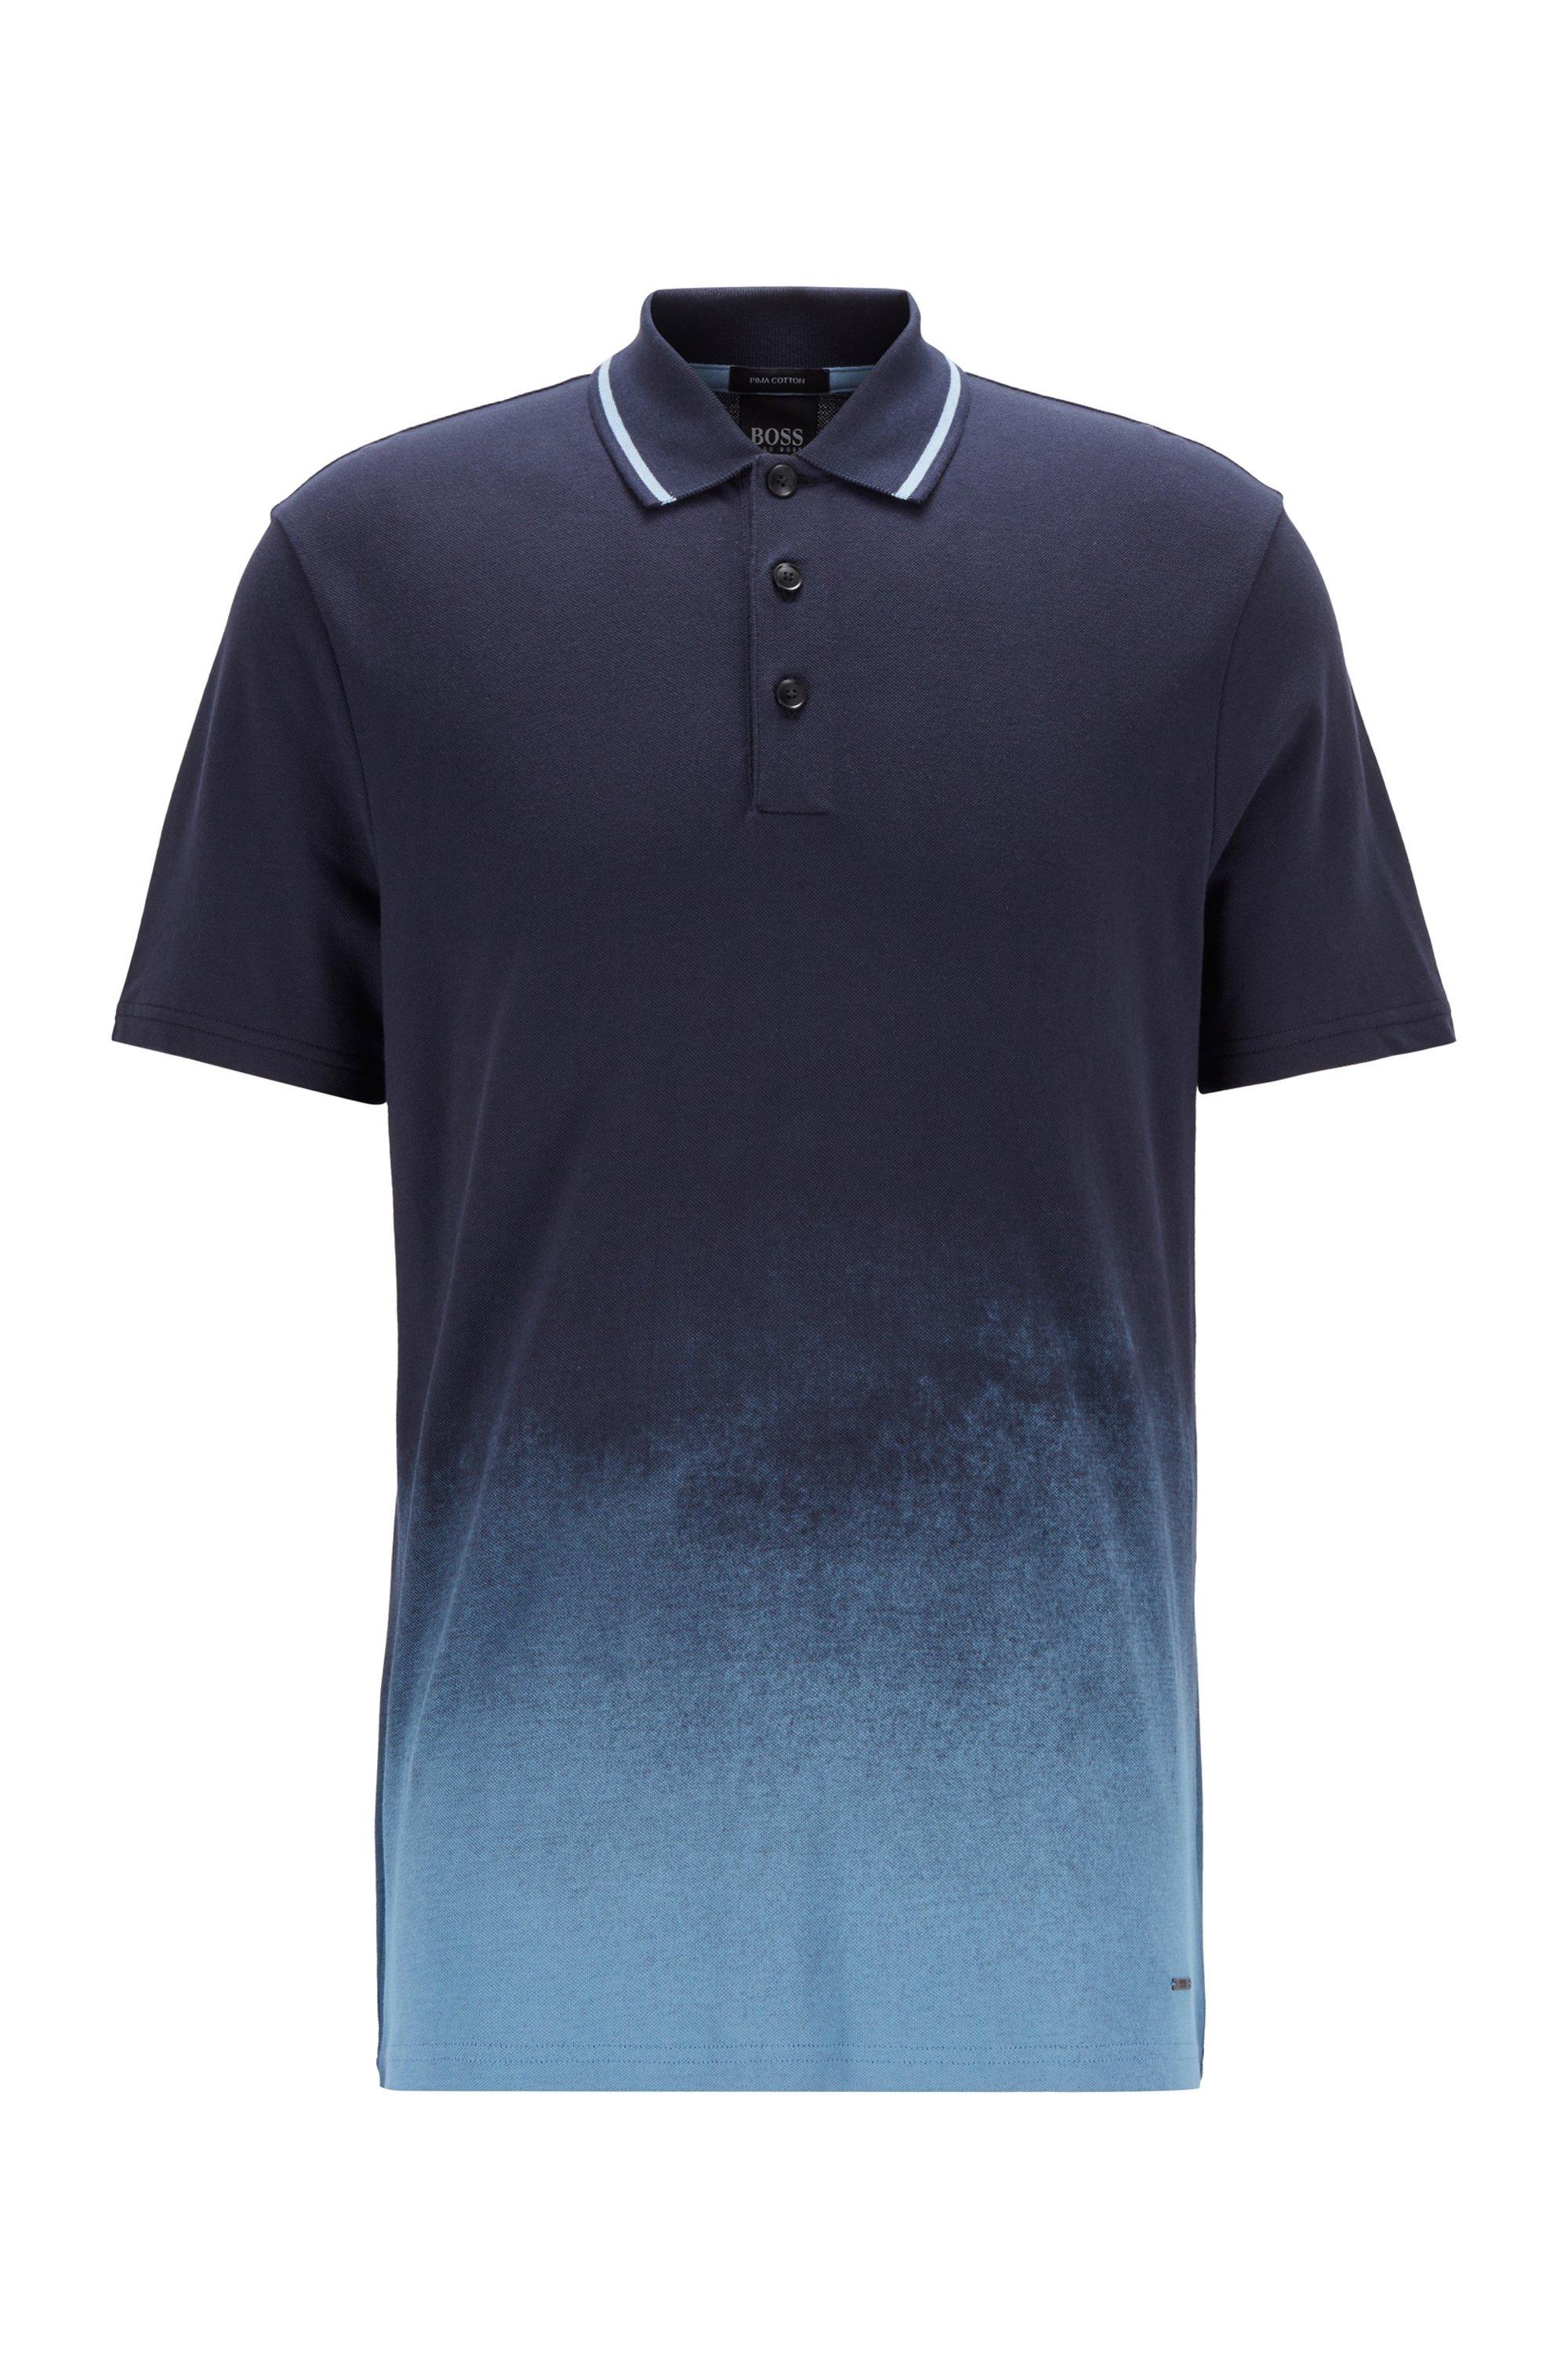 Dégradé-print polo shirt in Pima-cotton piqué, Dark Blue